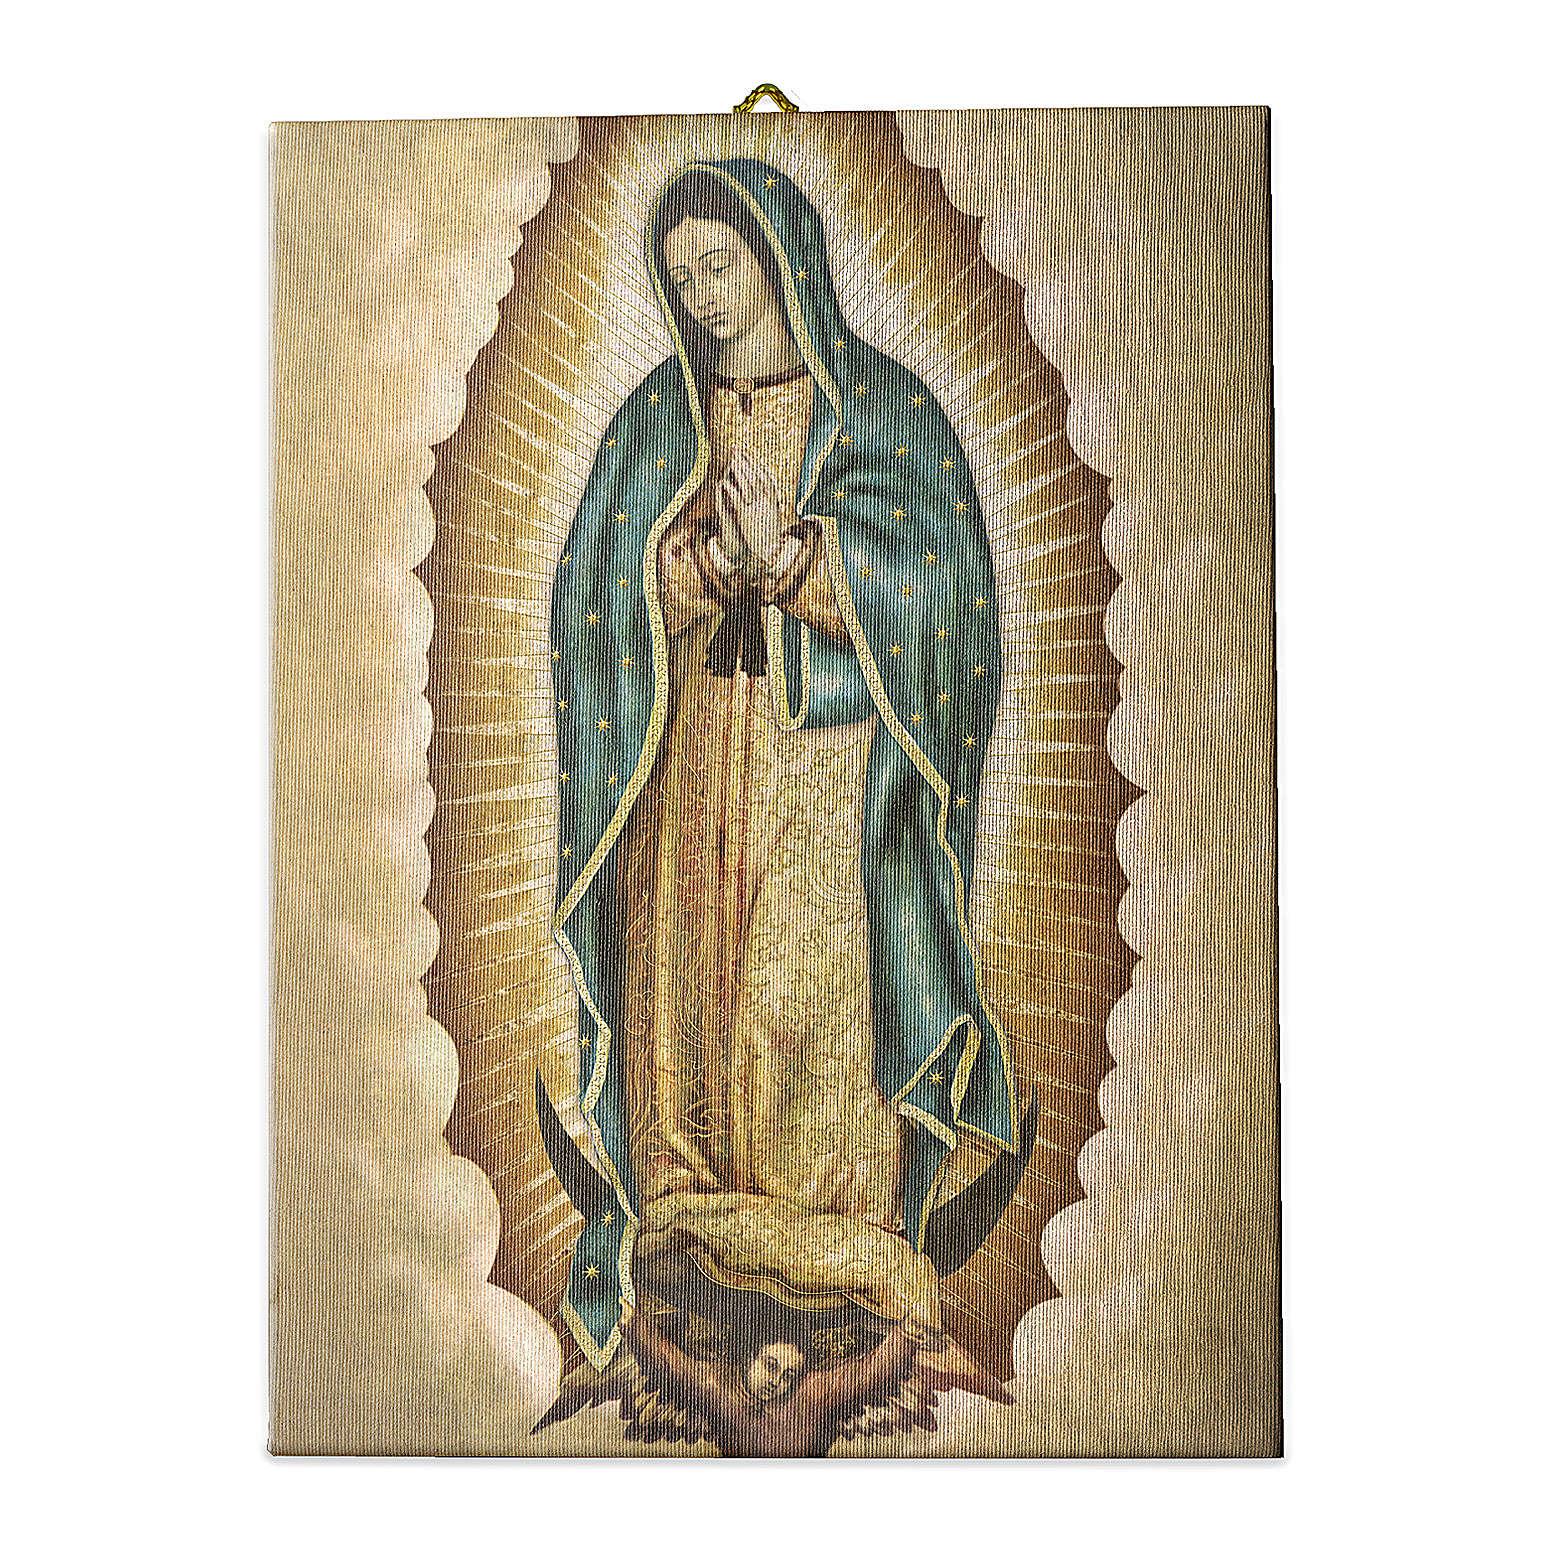 Cuadro sobre tela pictórica Virgen de Guadalupe 25x20 cm 3